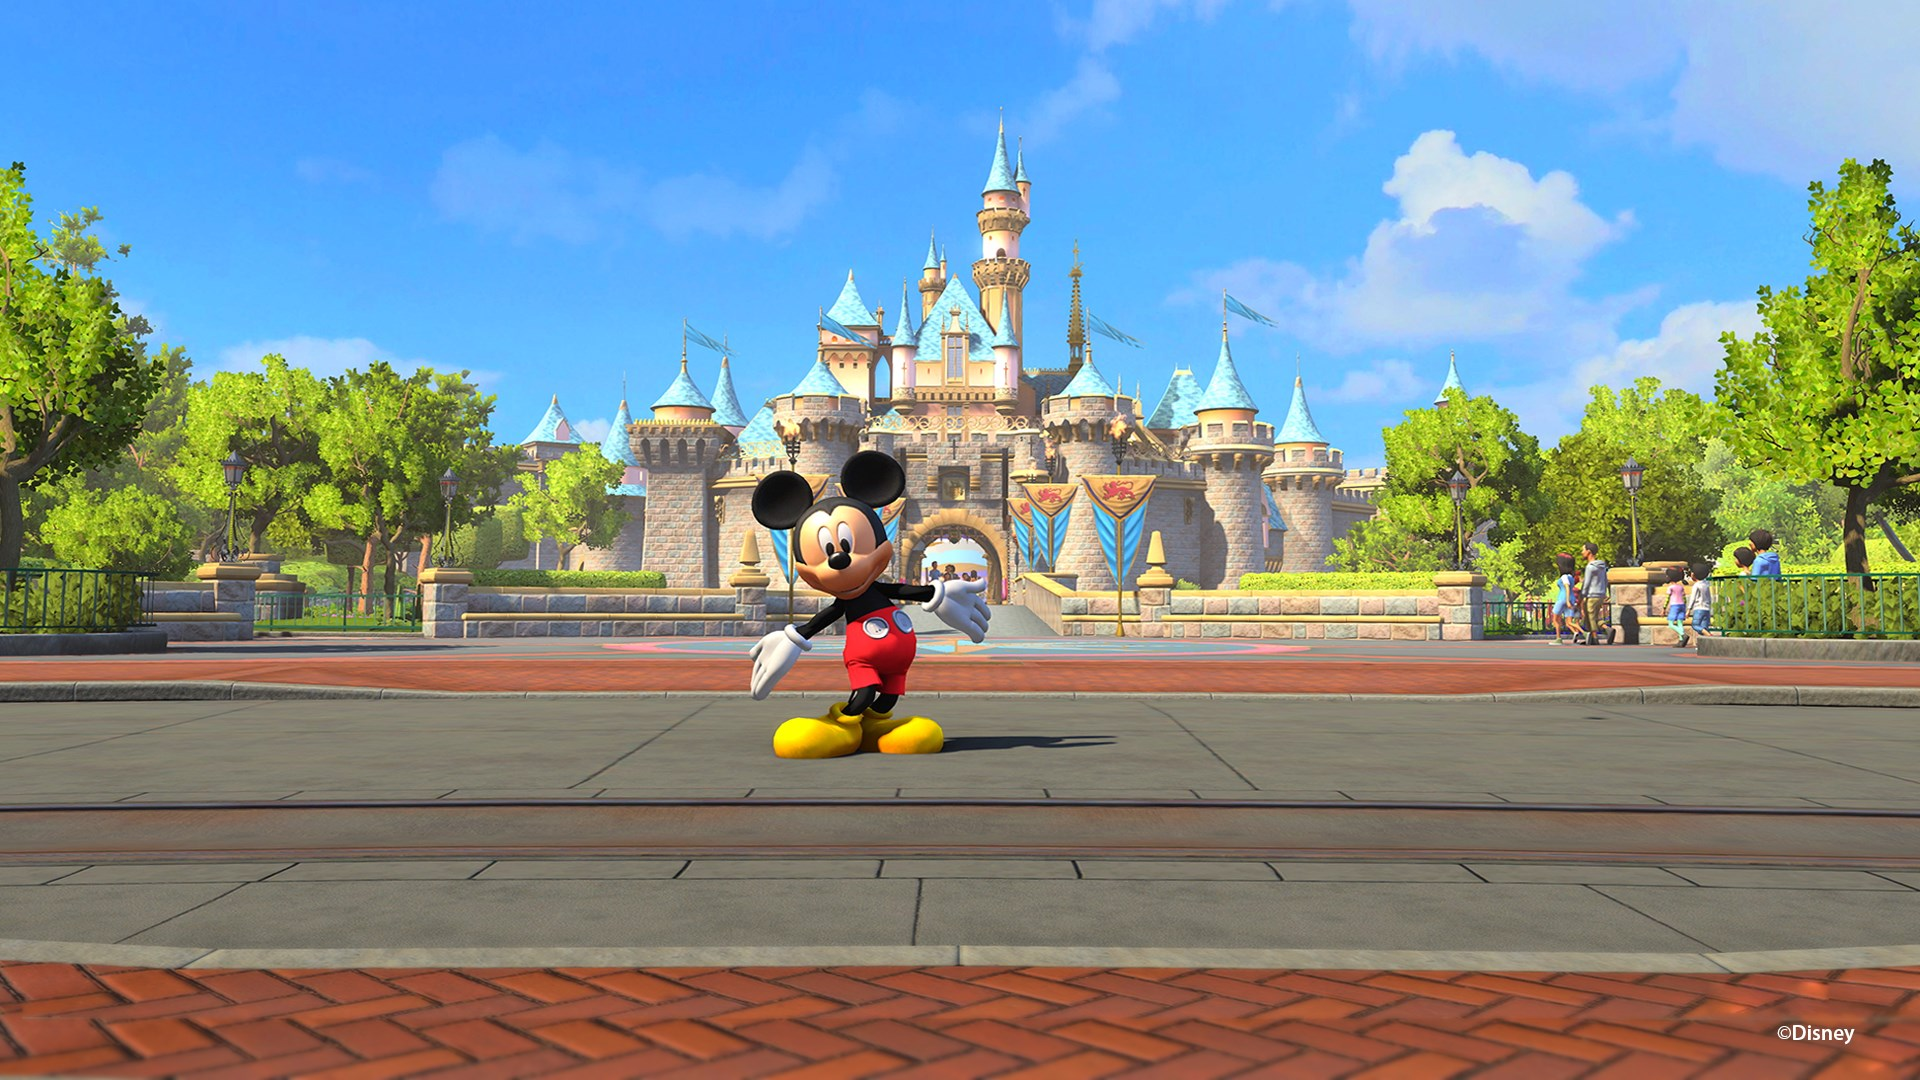 Find the best laptop for Disneyland Adventures